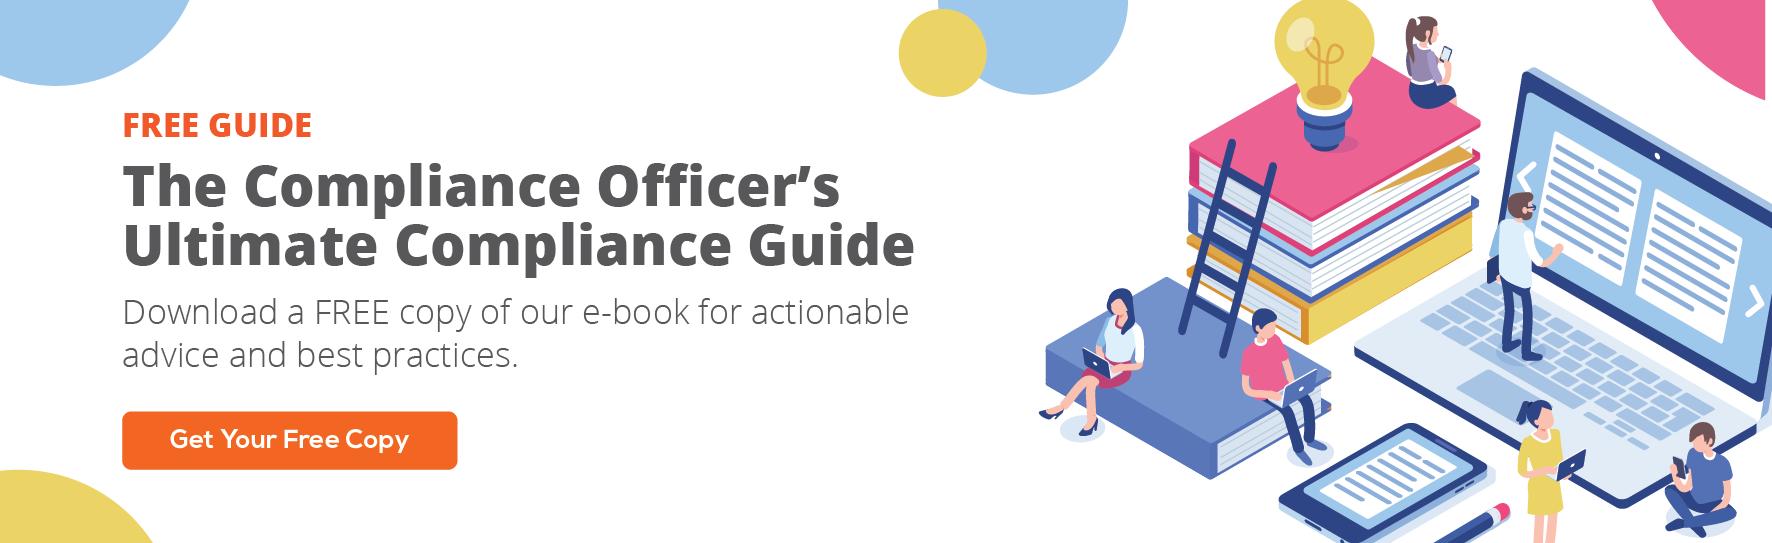 Compliance-Guide-LIAds-Mar20_Blog-CTA